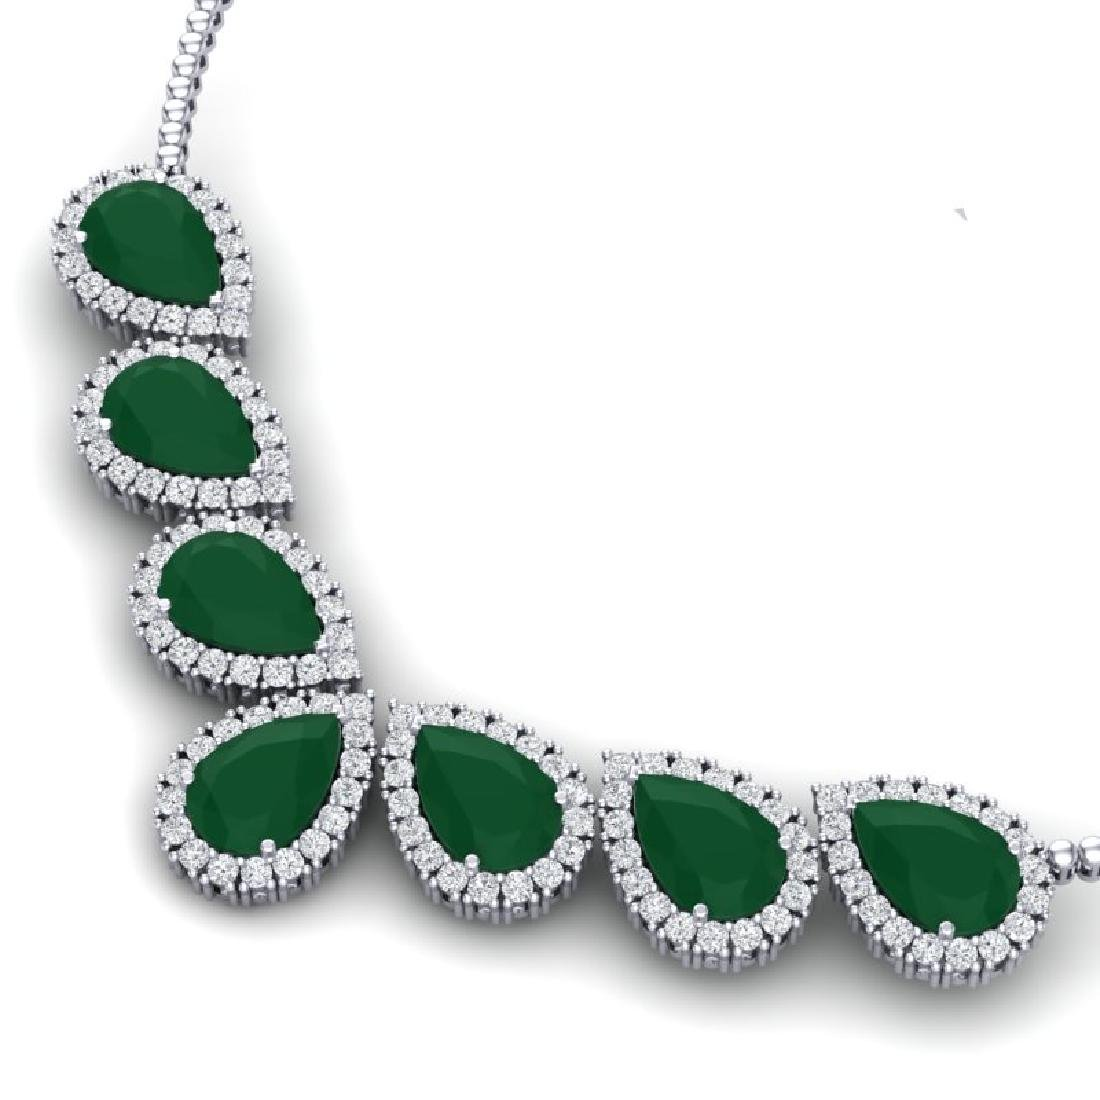 34.72 CTW Royalty Emerald & VS Diamond Necklace 18K - 2